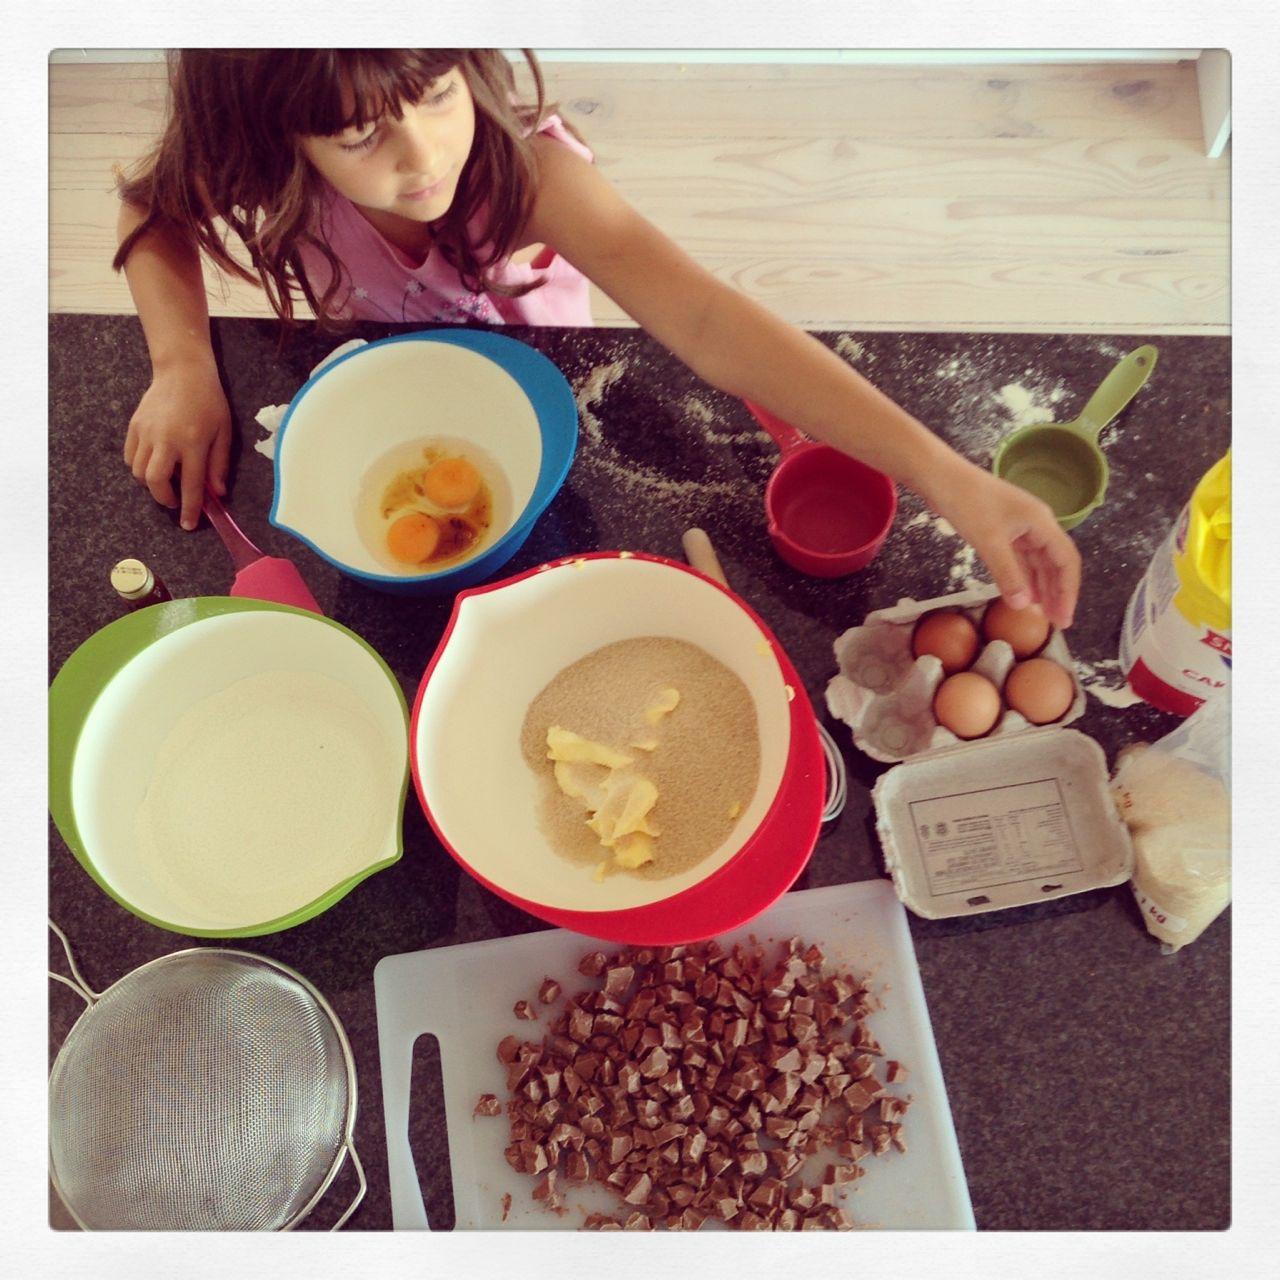 Baking choc chip cookies...